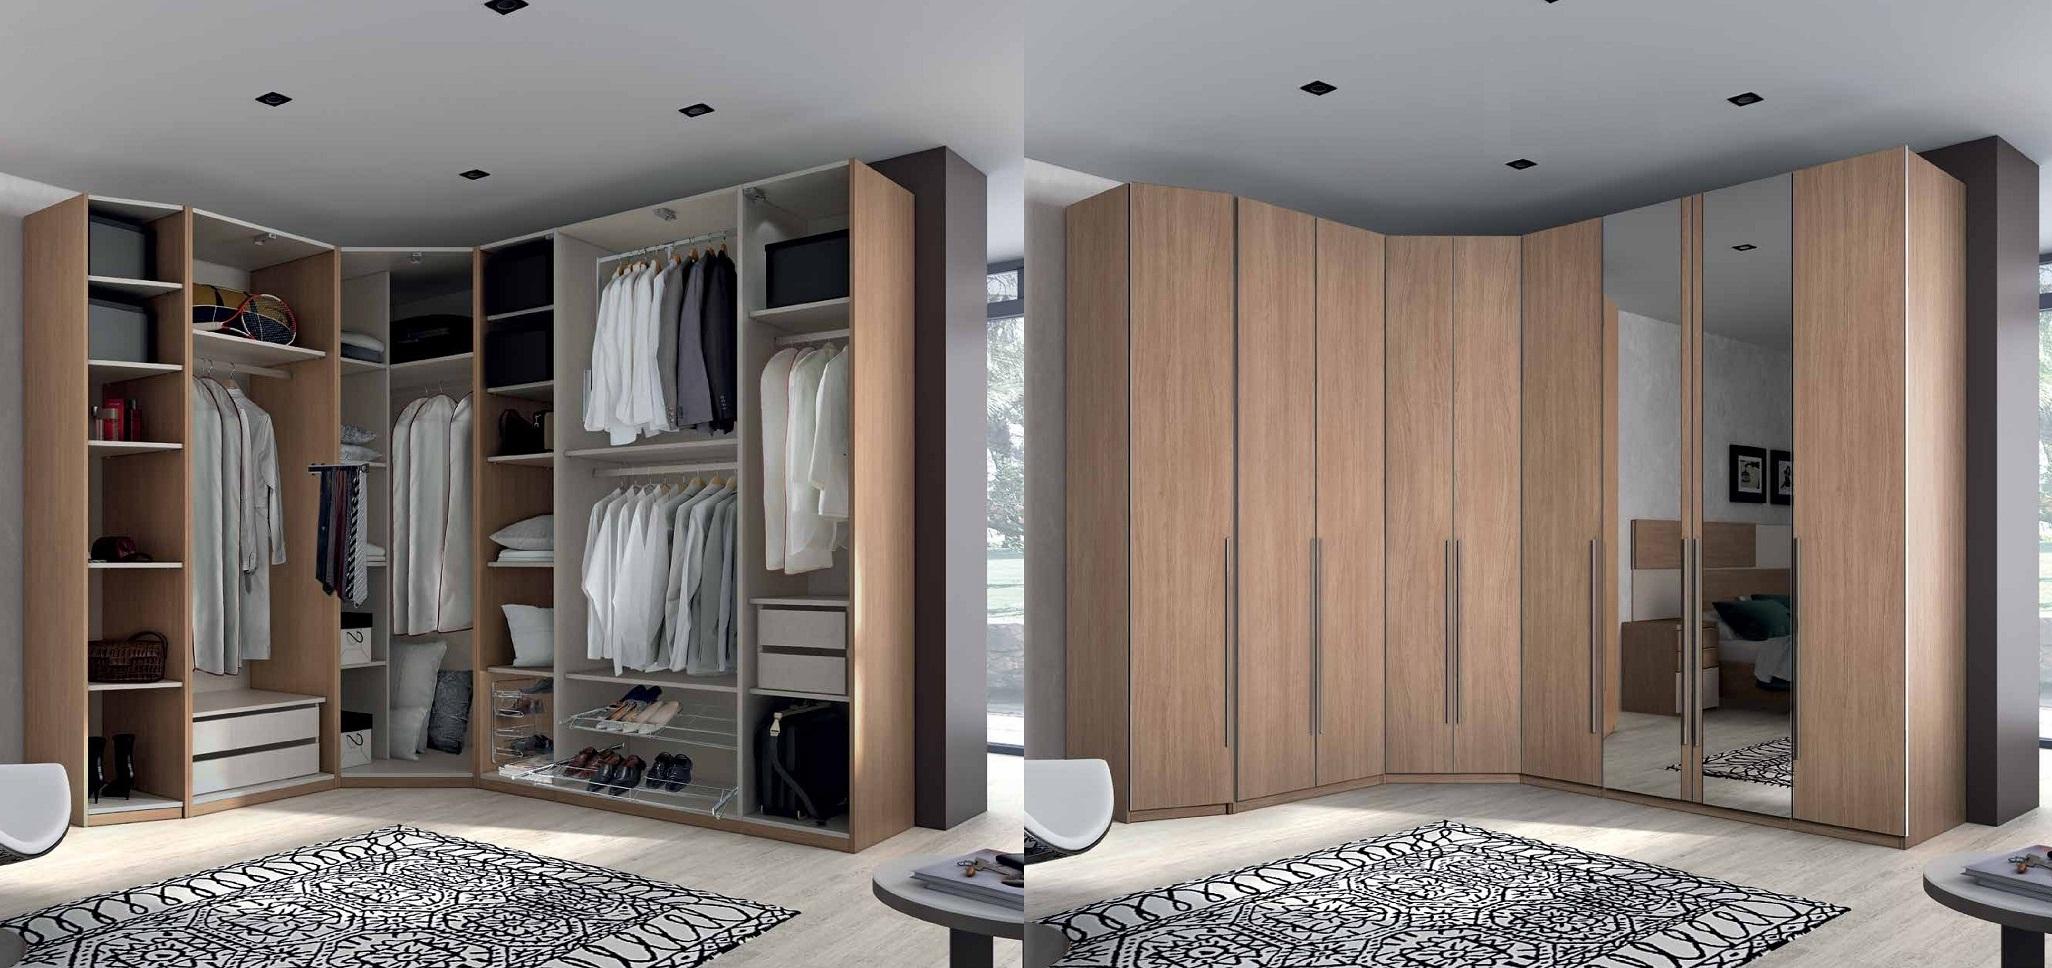 chambre dressing emjelu sas showroom chez soi design. Black Bedroom Furniture Sets. Home Design Ideas